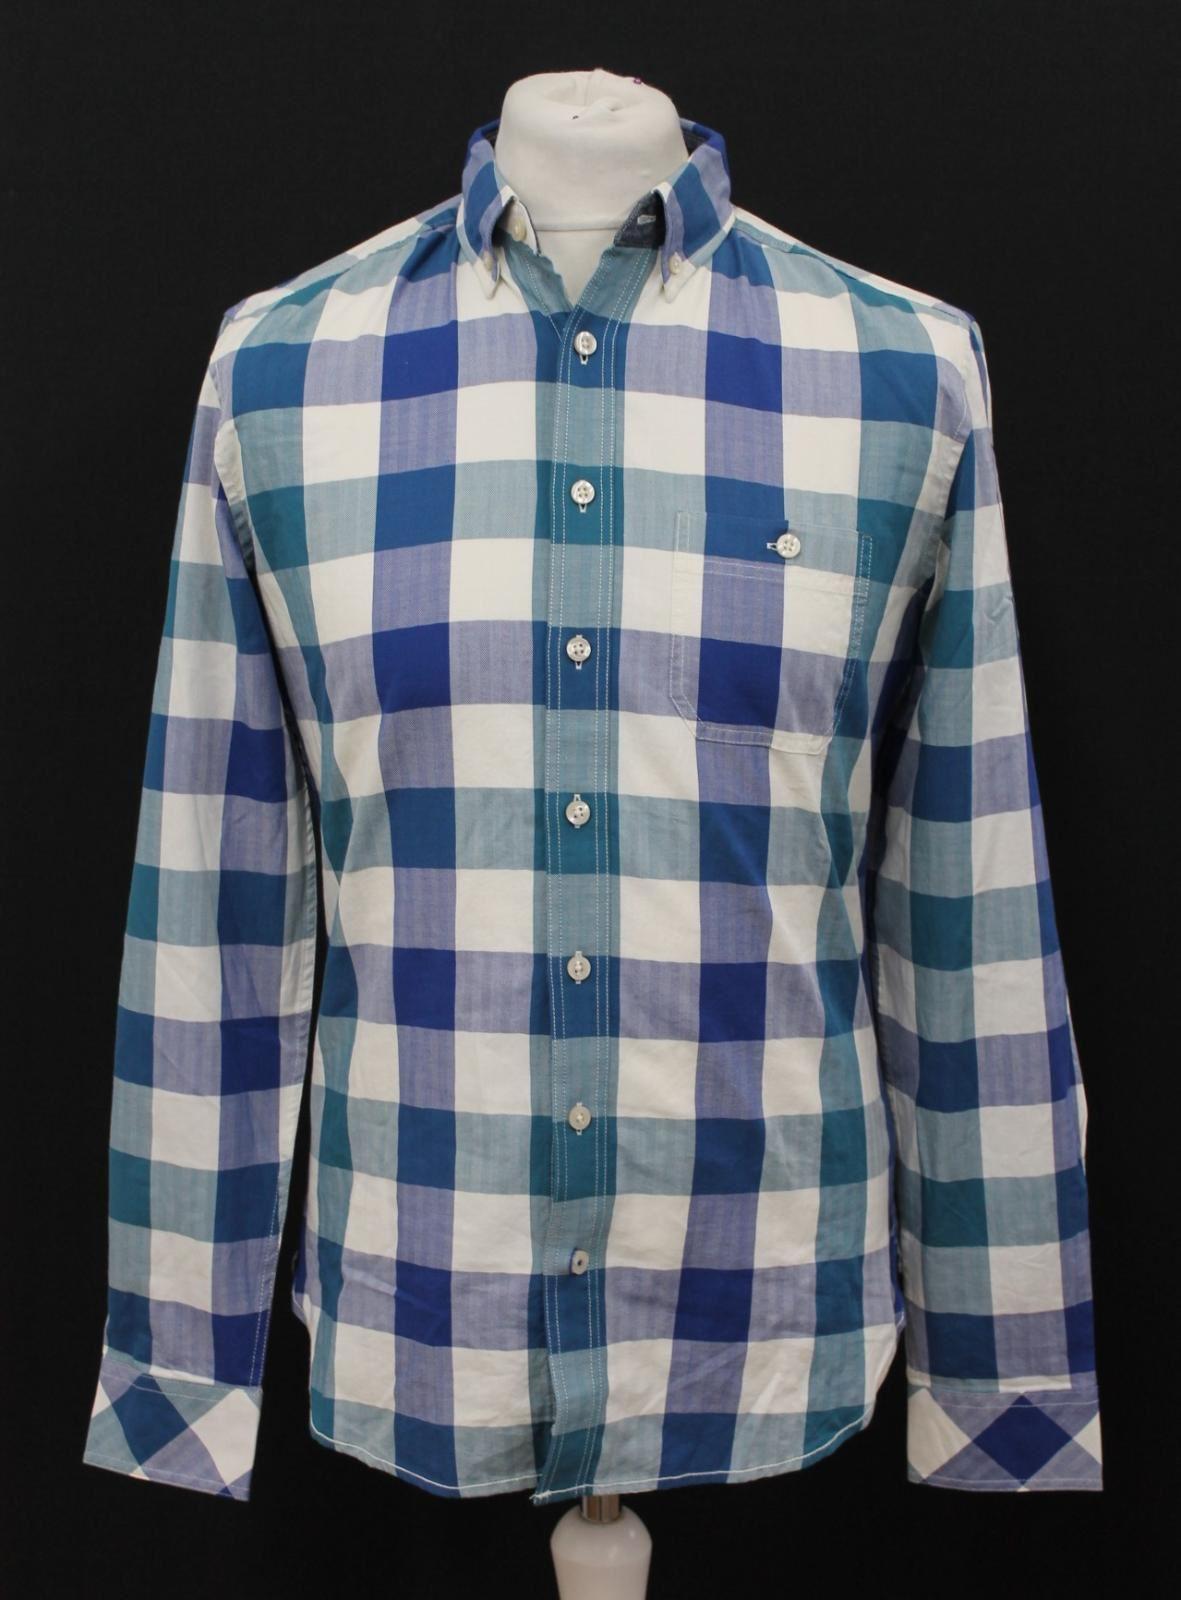 BNWT Joules Uomo X-Hewitt Blu Teal Quadretti Slim Fit Puro Cotone Camicia Taglia S